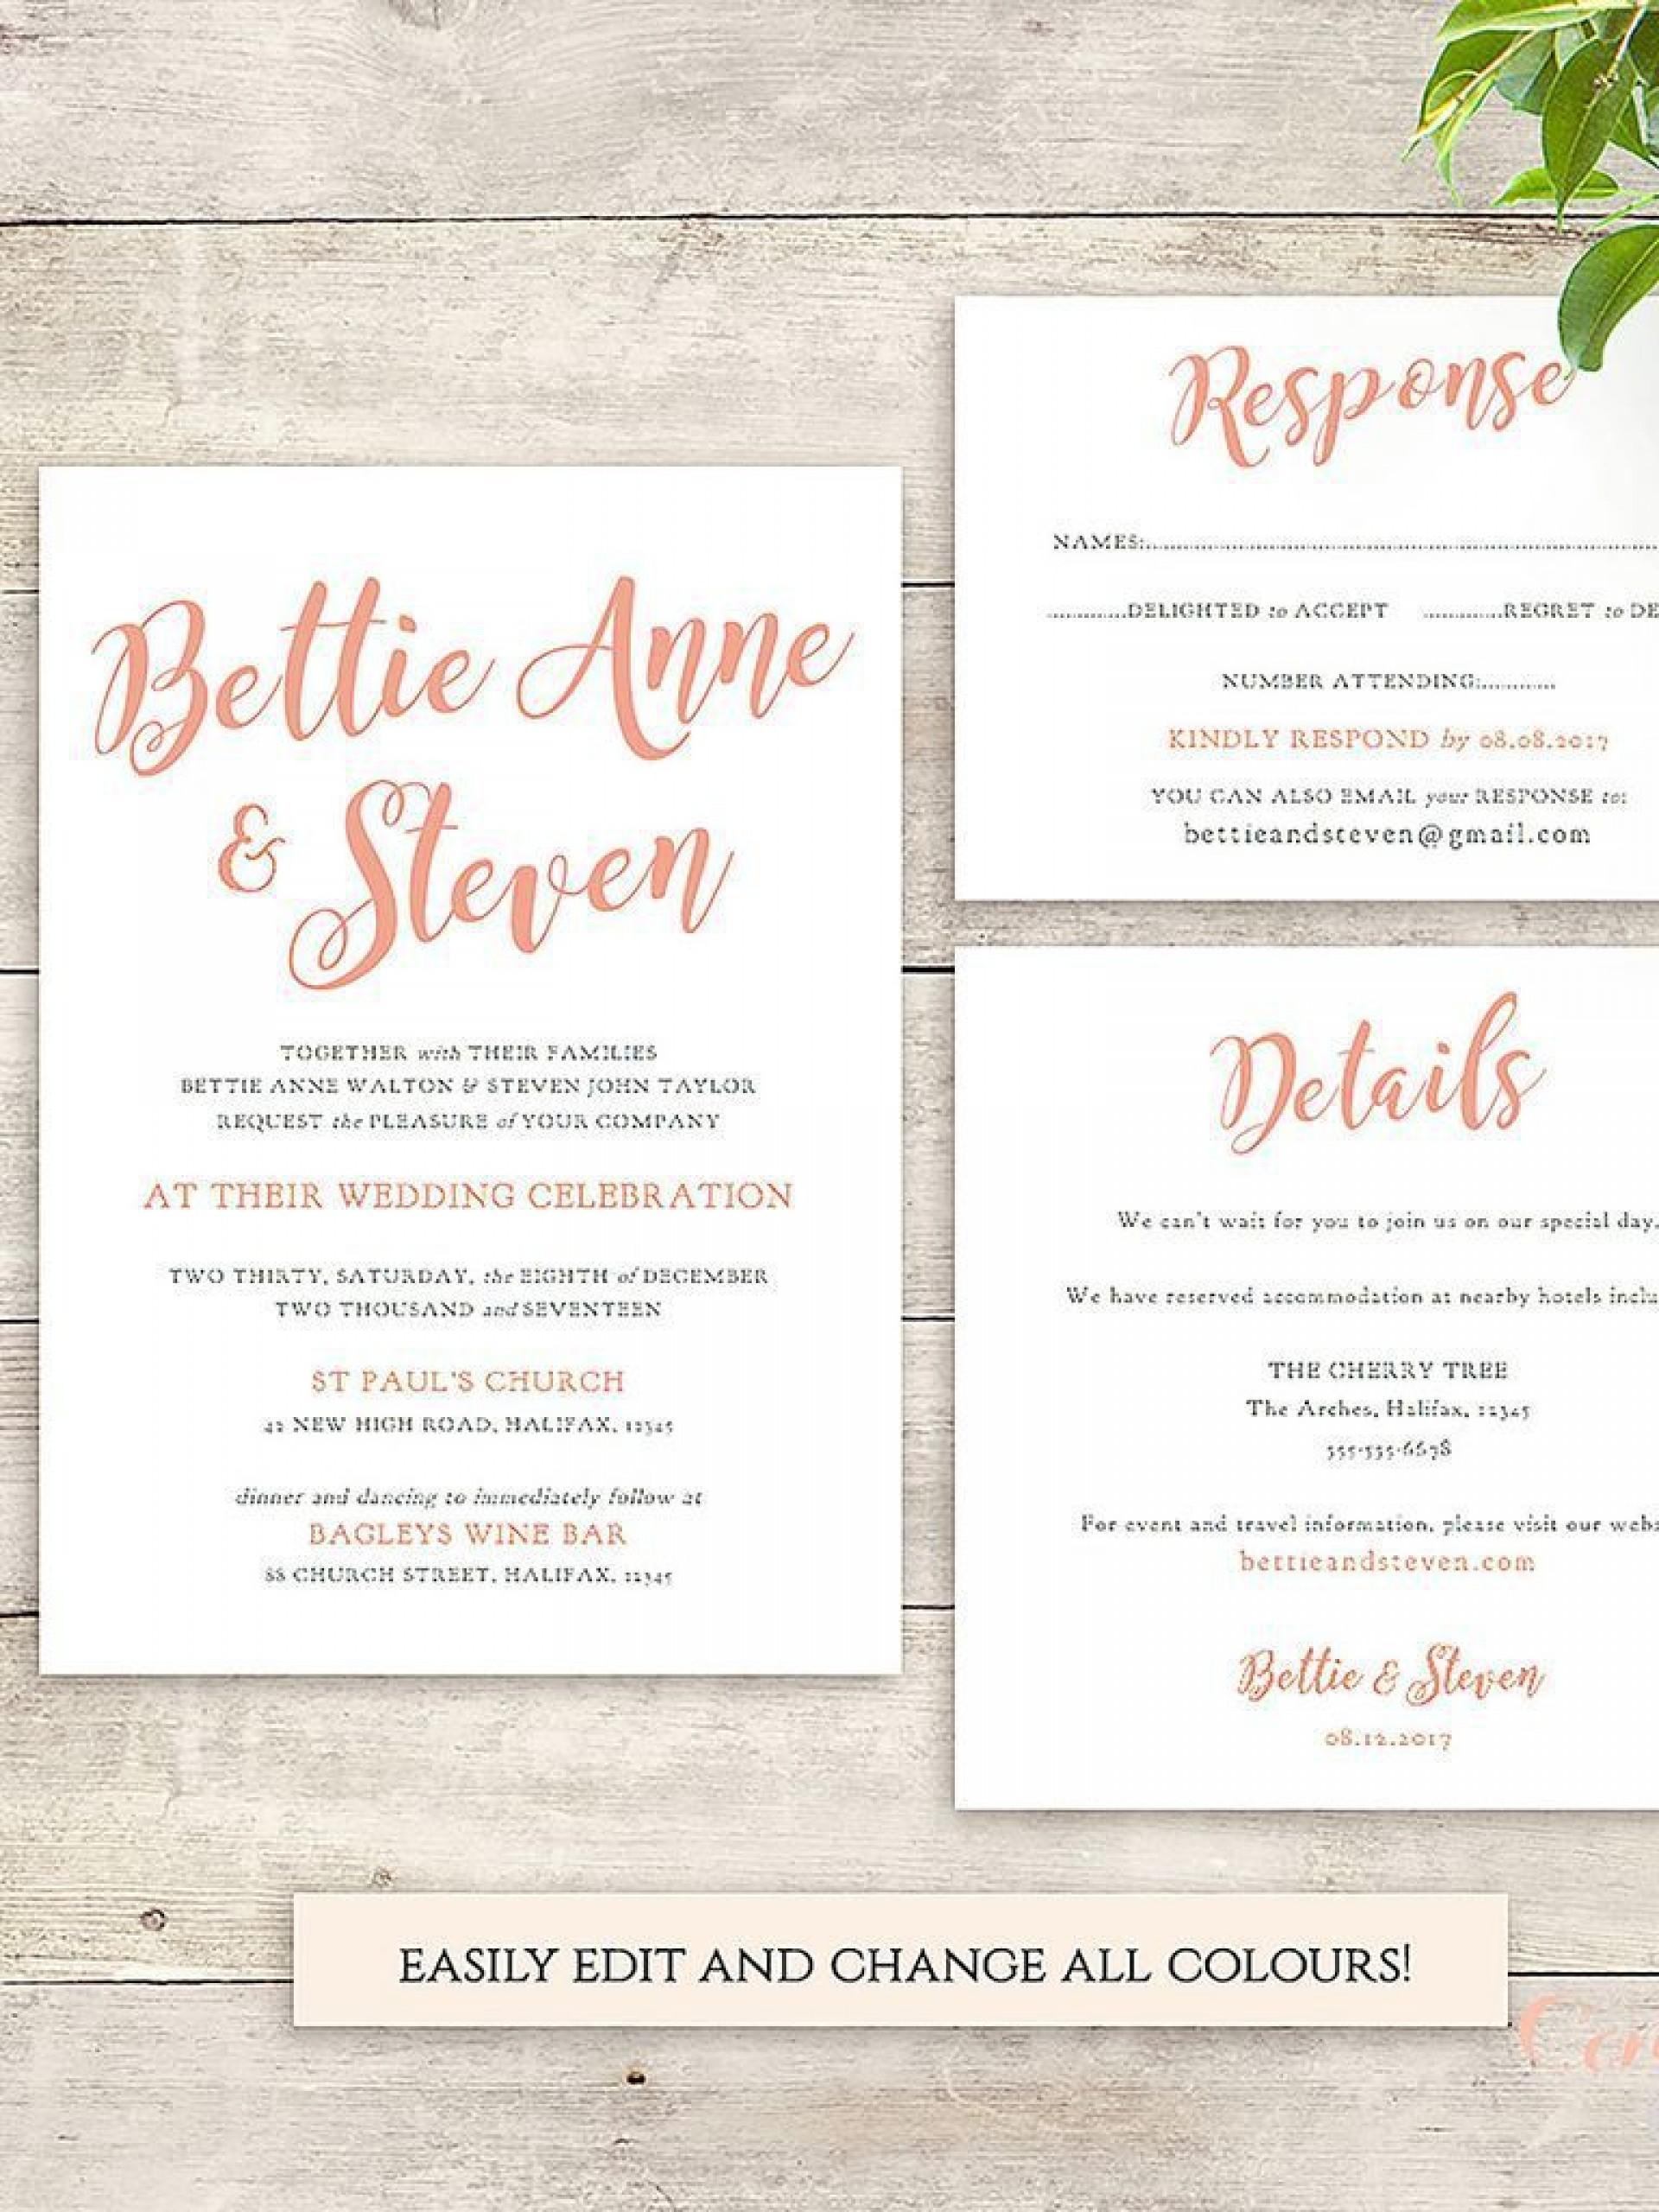 003 Phenomenal Sample Wedding Invitation Template Concept  Templates Wording Card1920